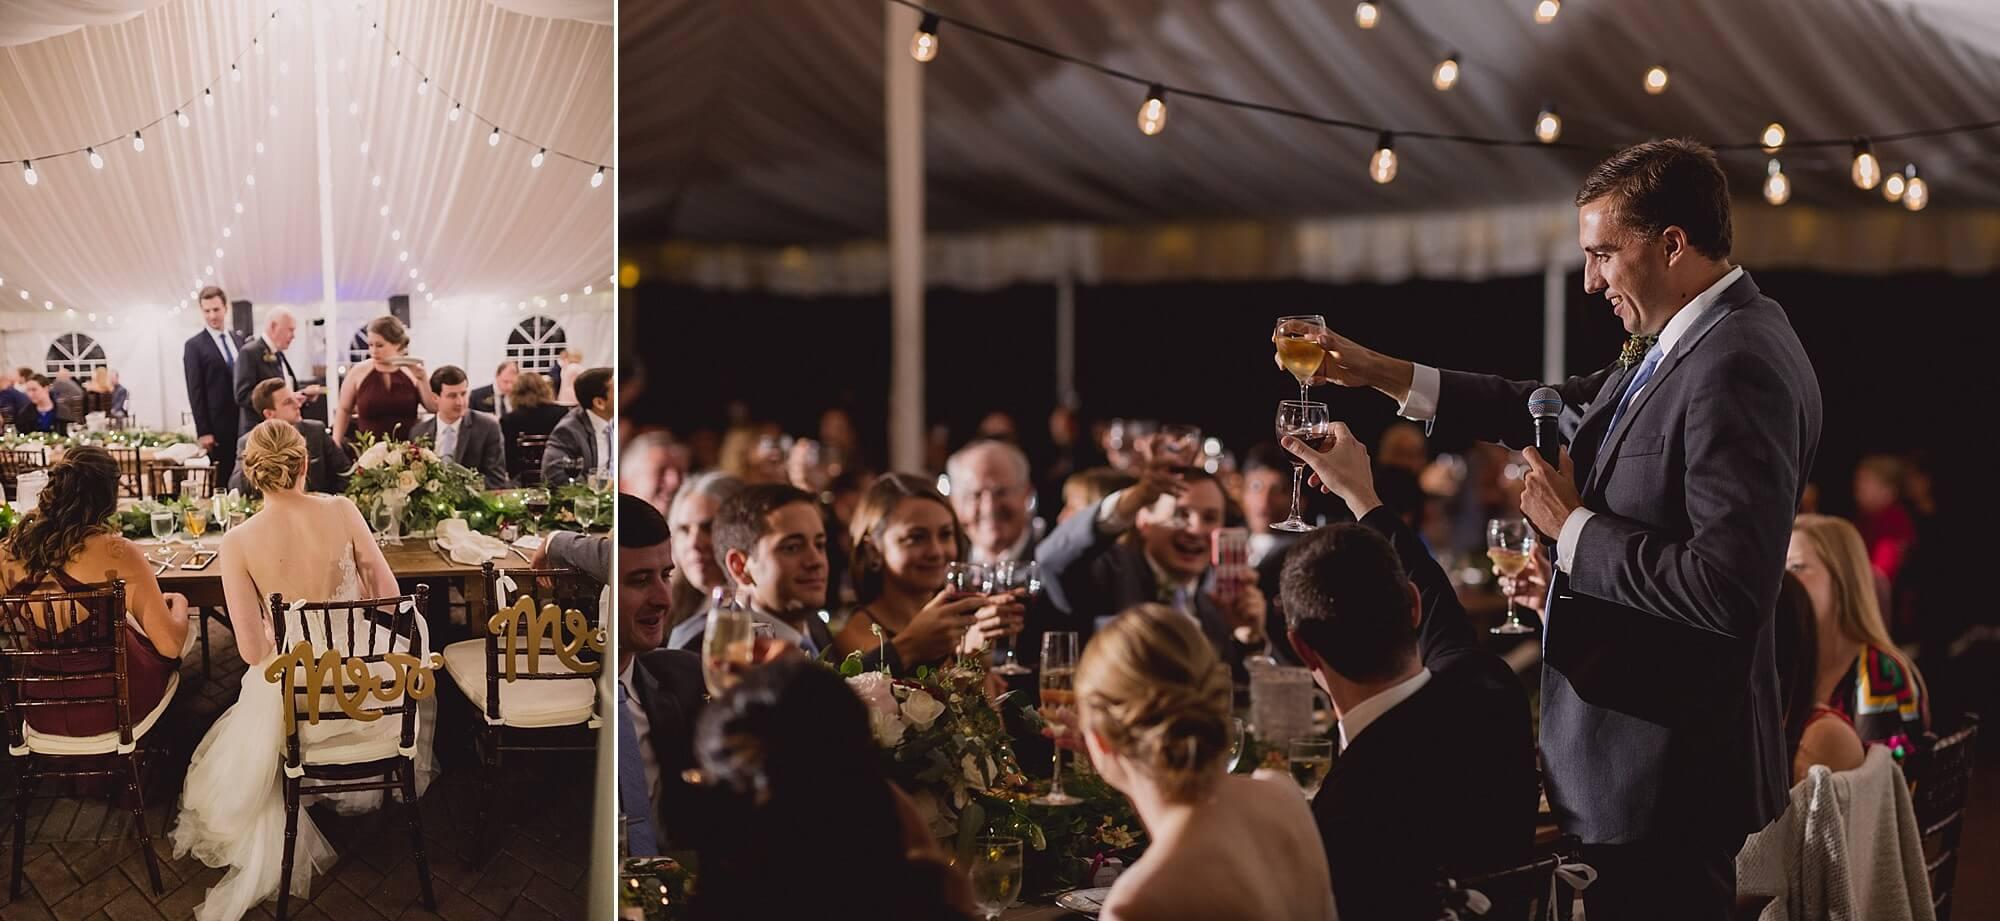 Commanders Mansion Wedding - Ebersole Photo_0029.jpg